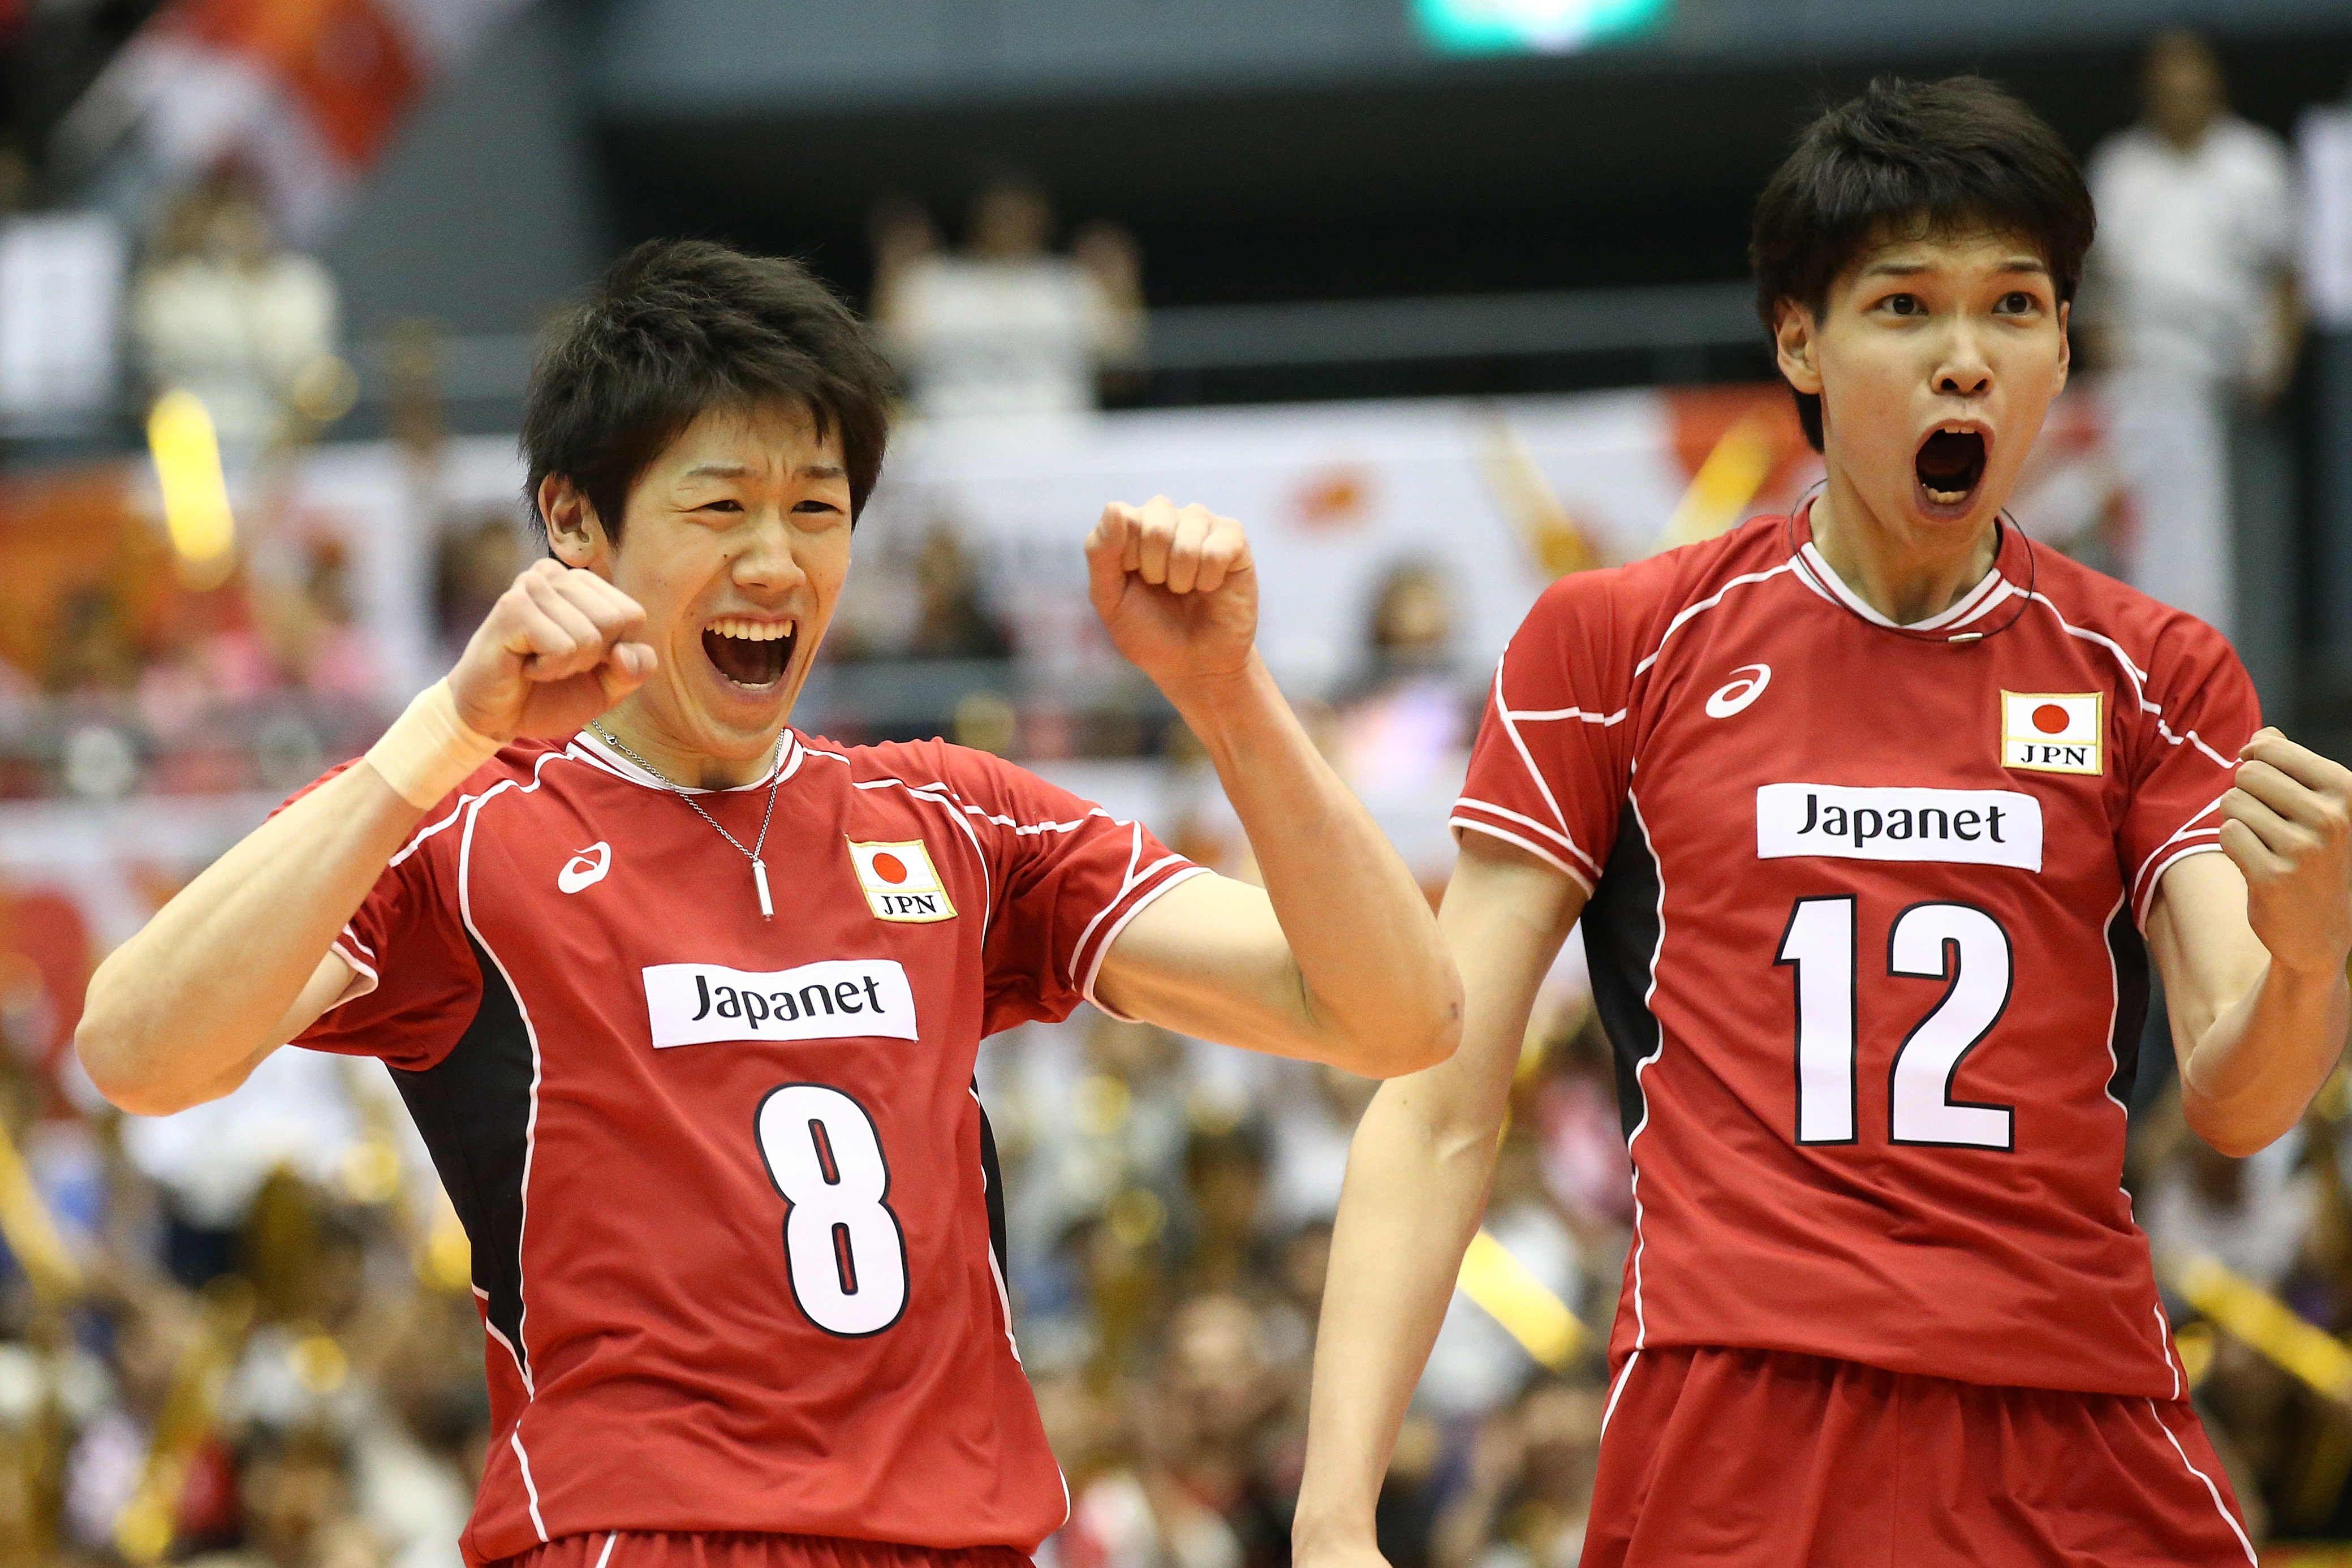 Yuki Ishikawa In 2020 Japan Volleyball Team Mens Volleyball Volleyball Team